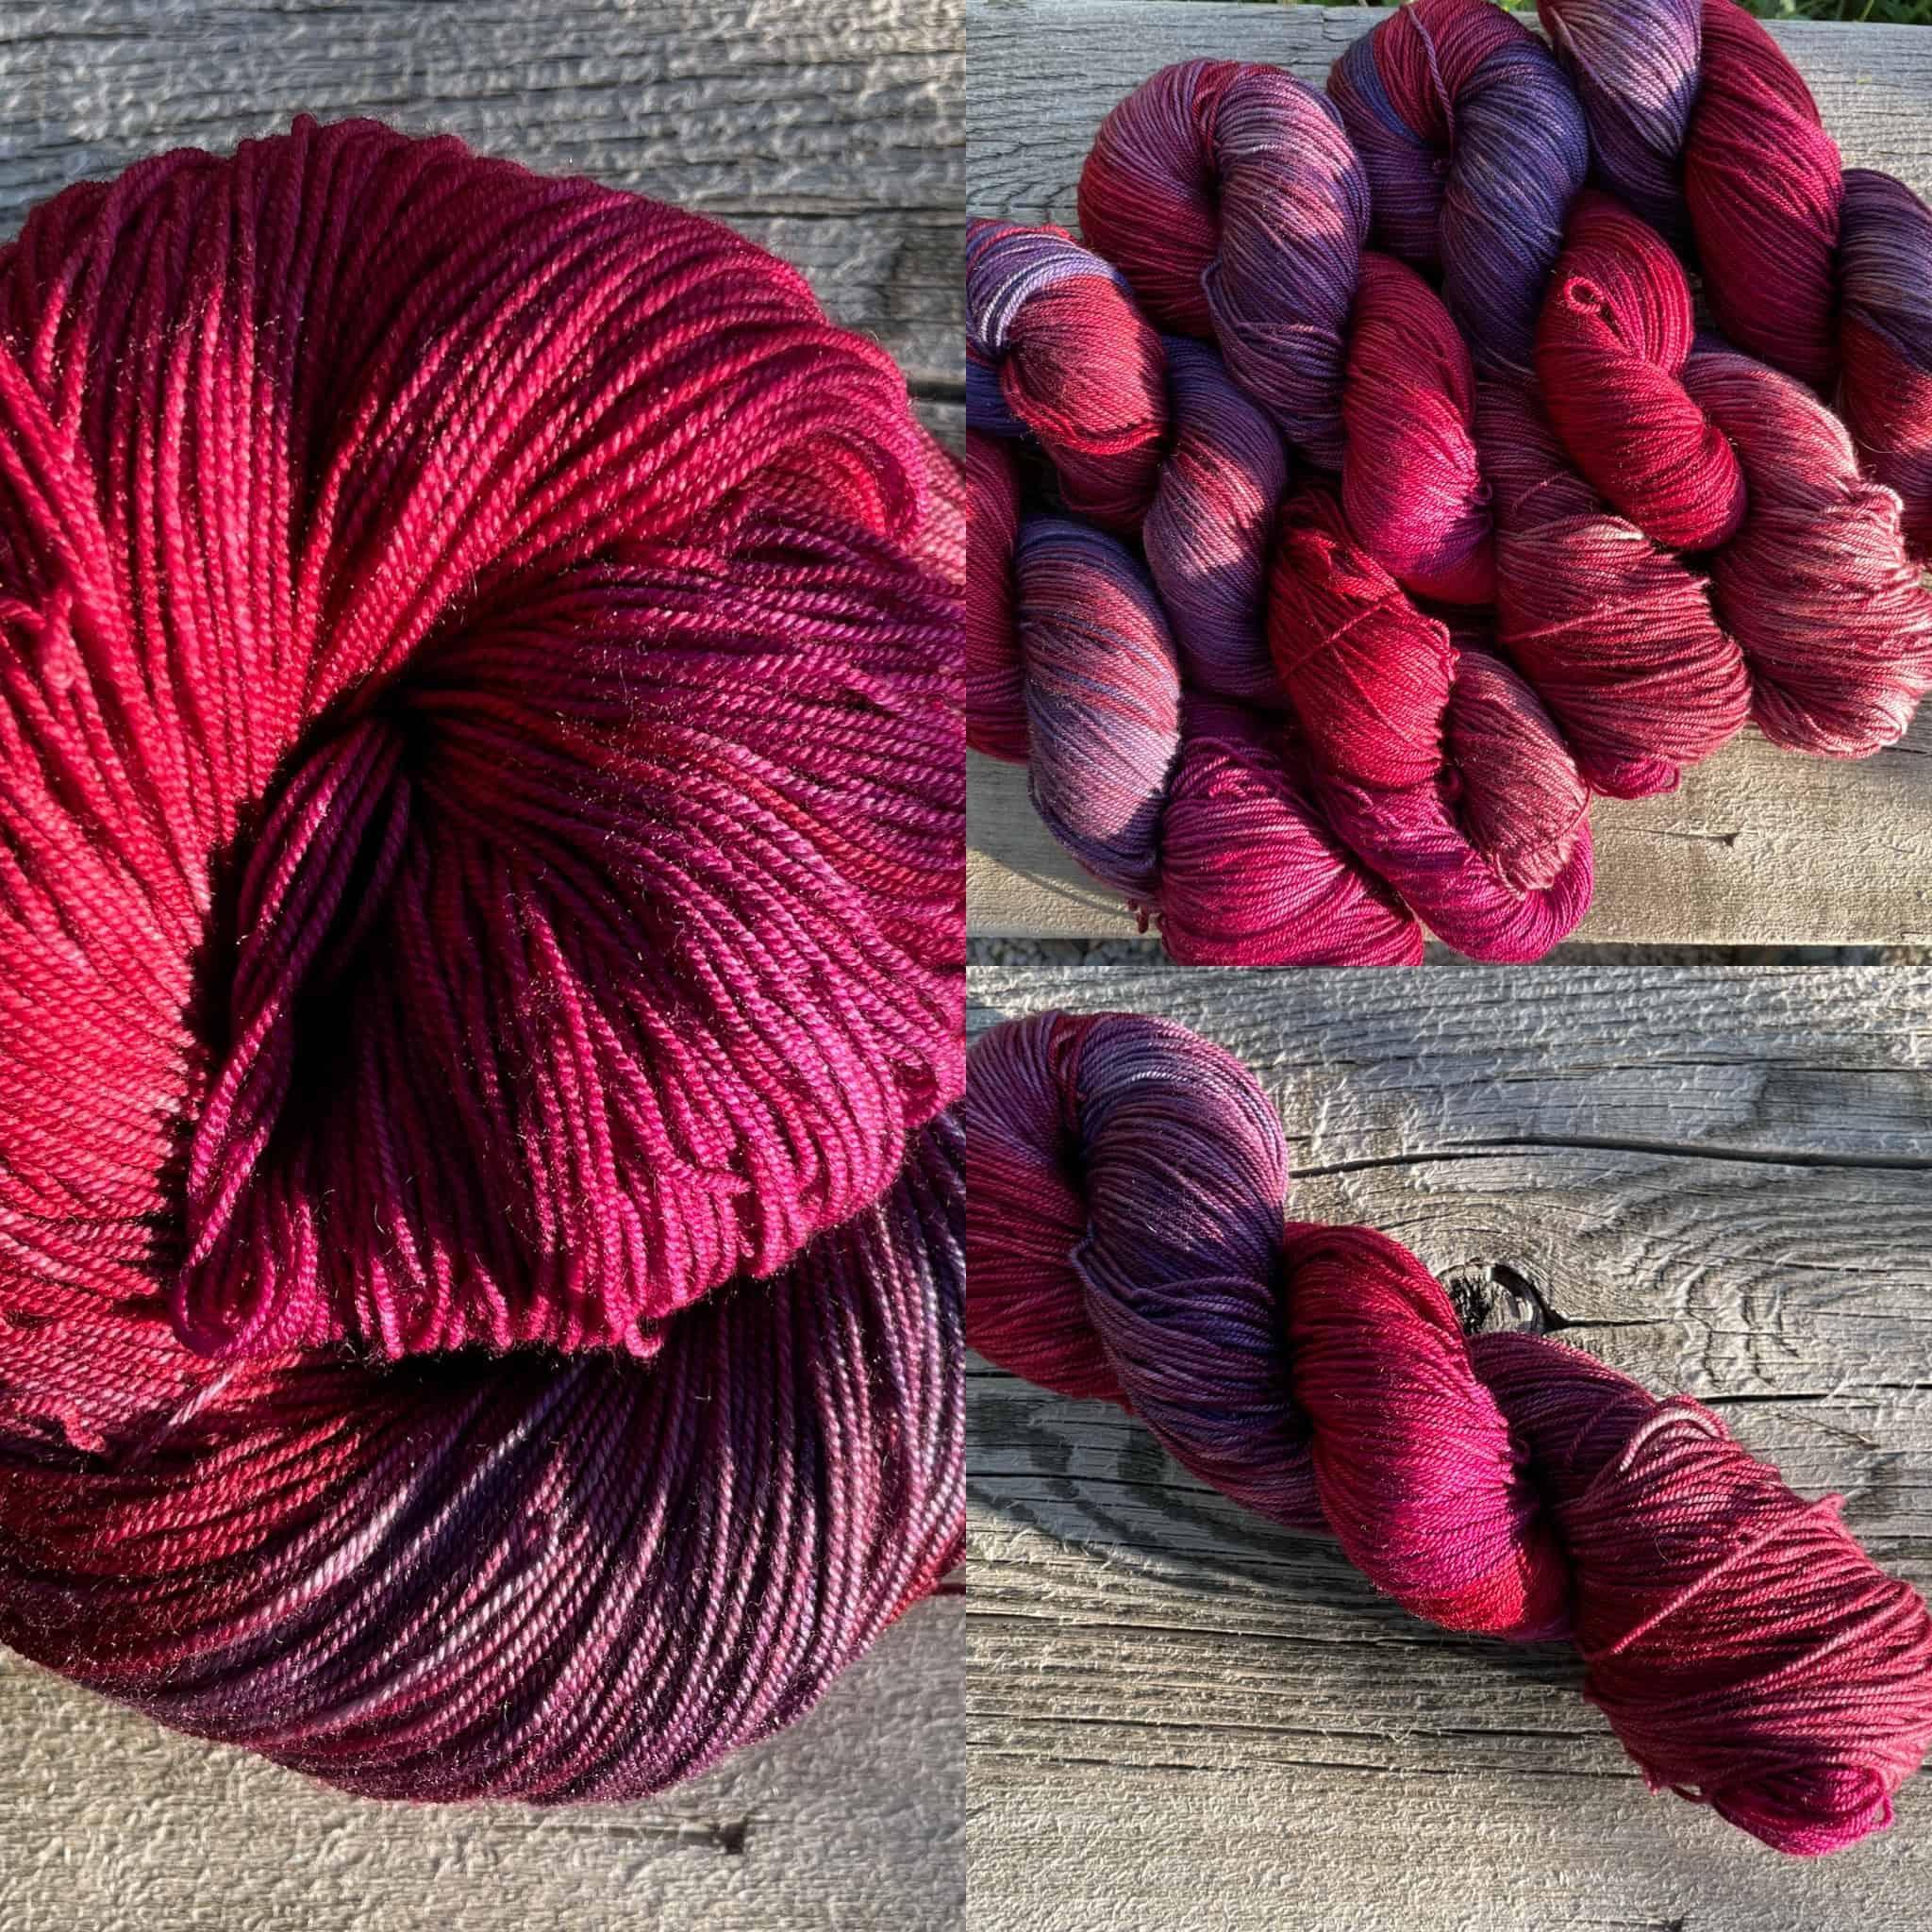 Pink and purple yarn.